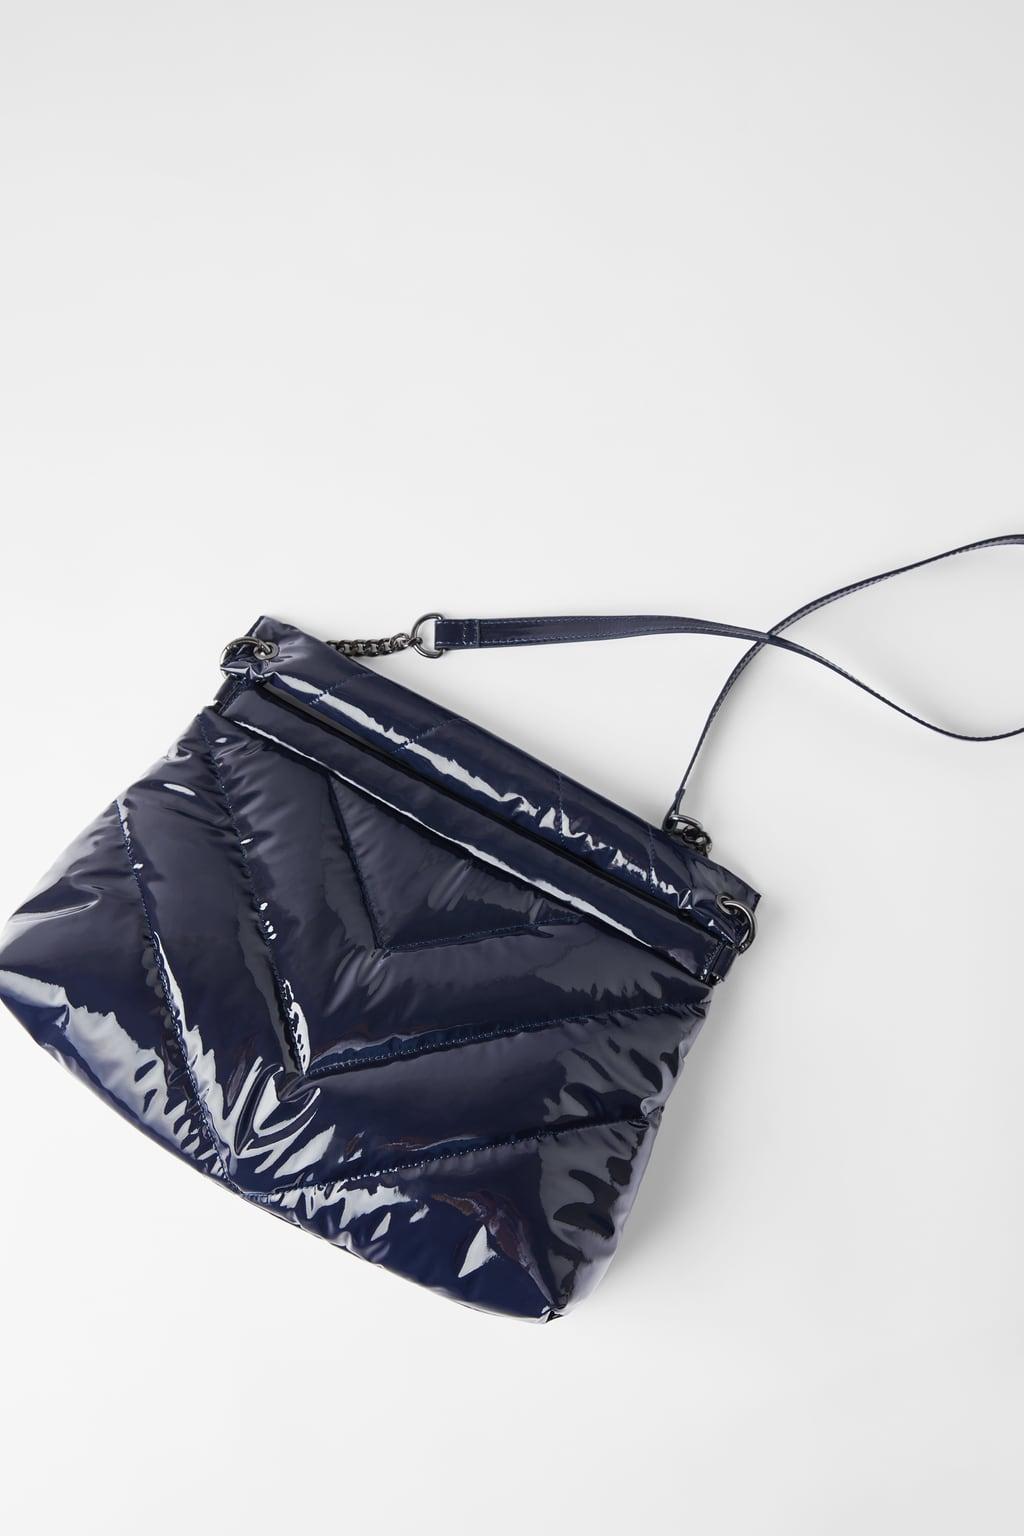 zara quilted maxicrossbody bag